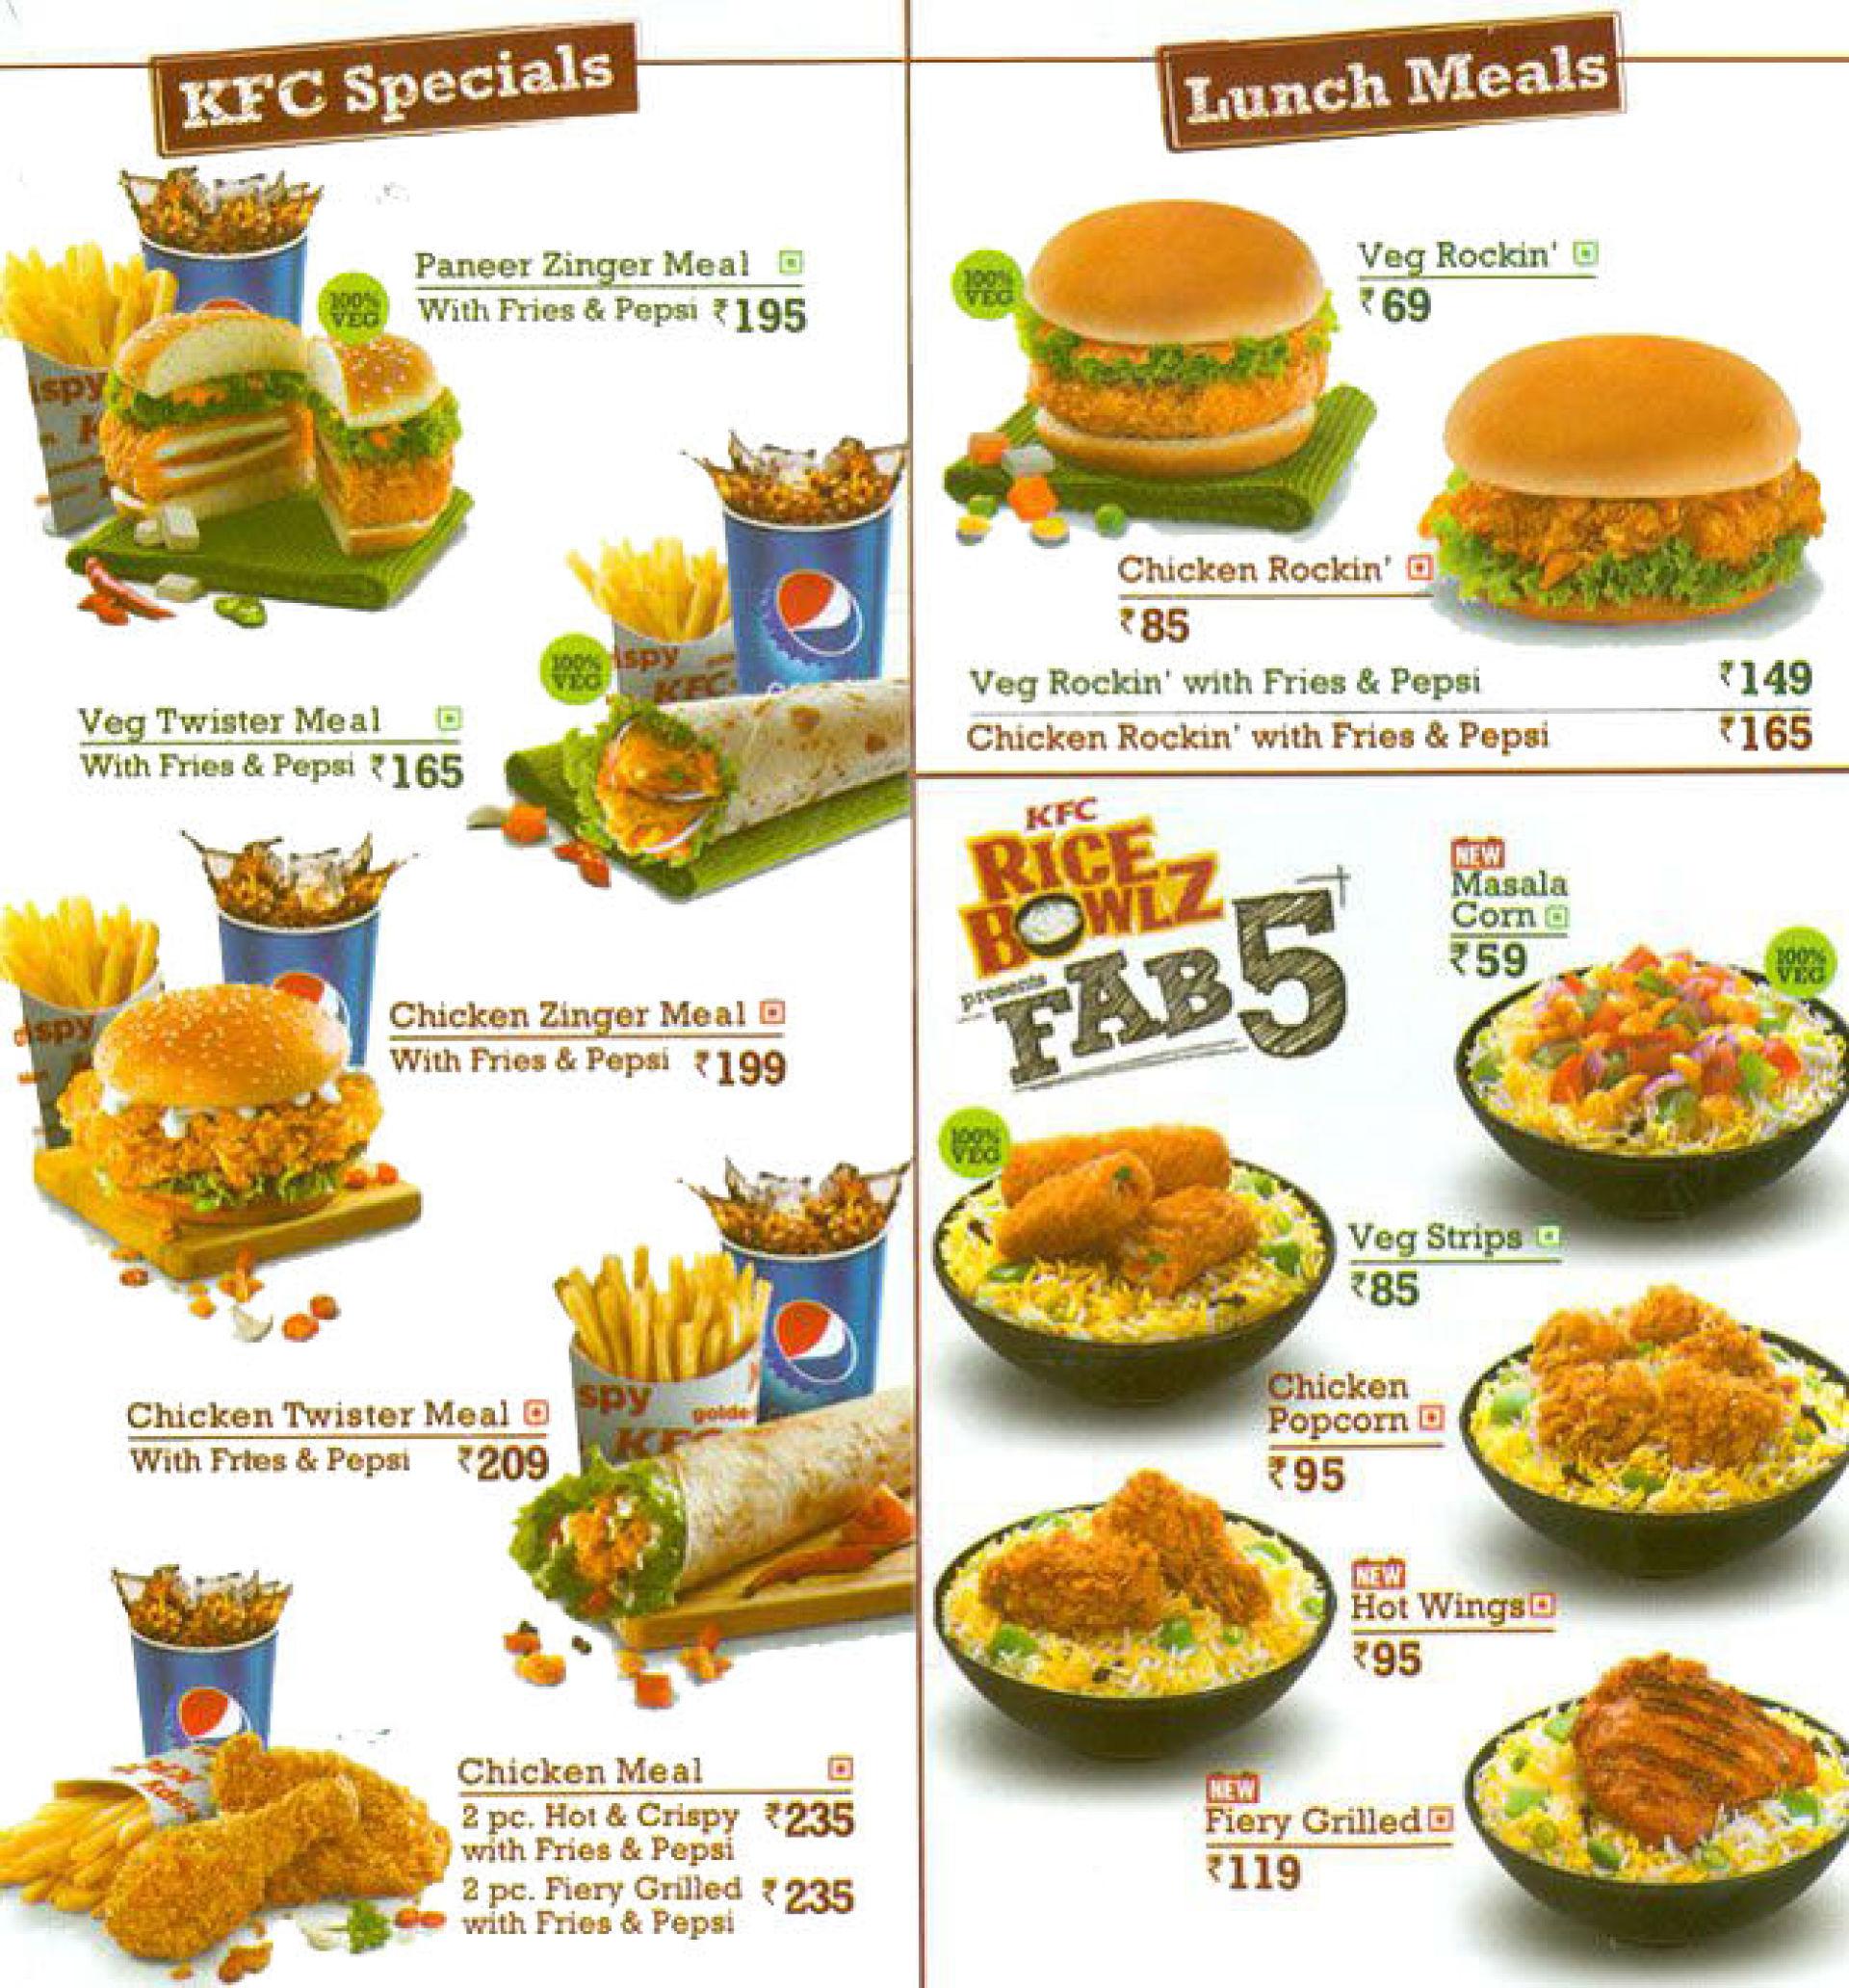 Menu of the KFC